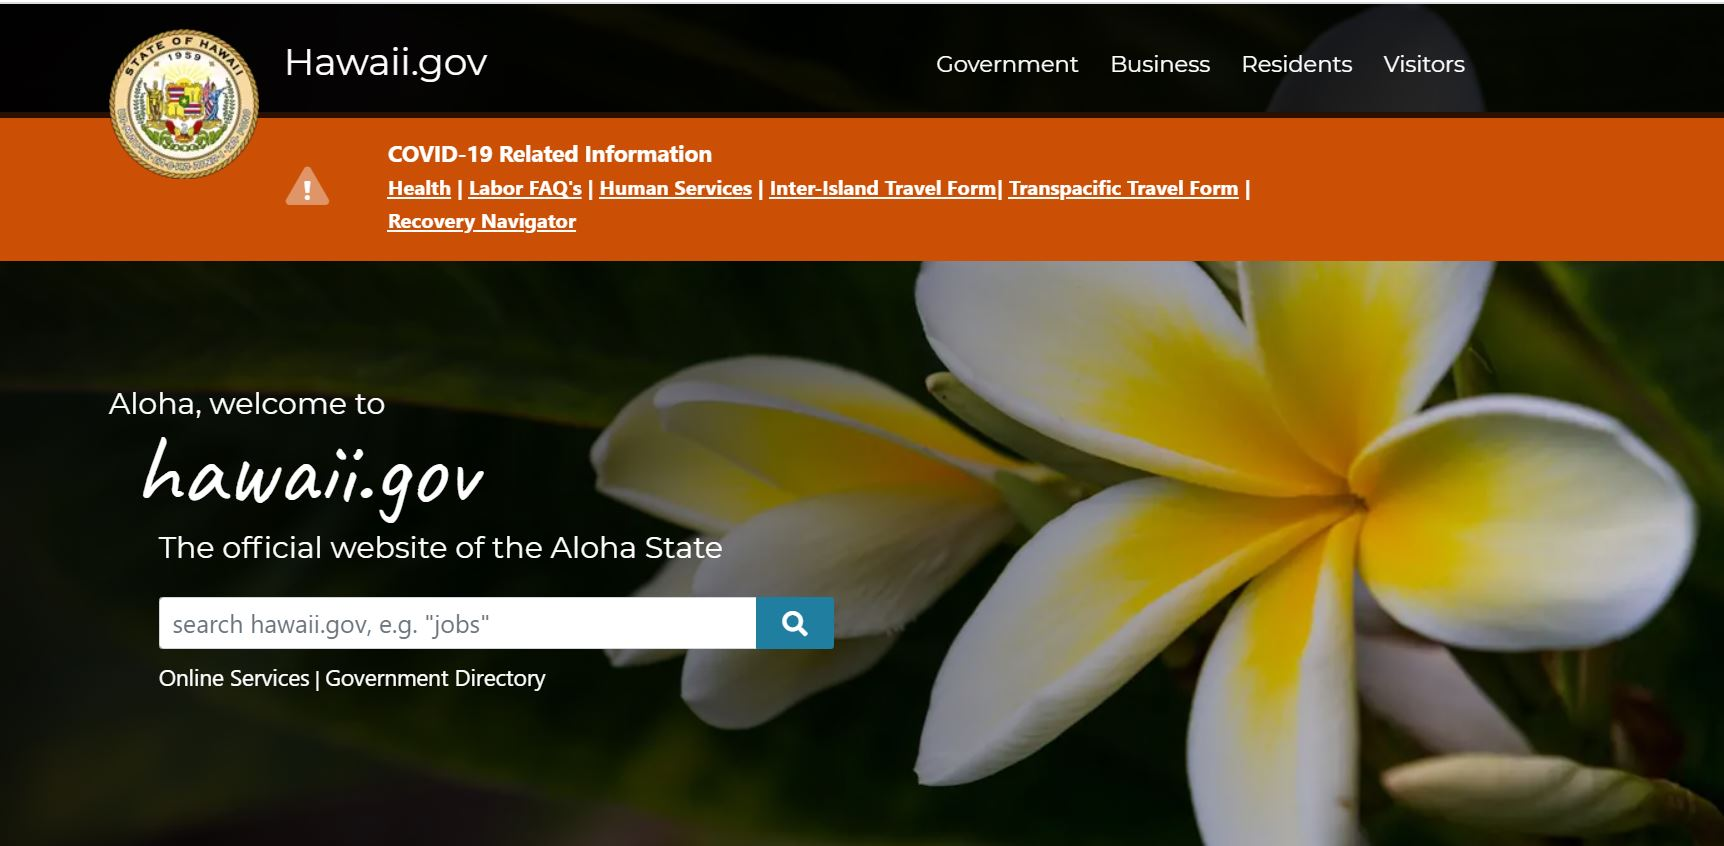 New ehawaii.gov homepage